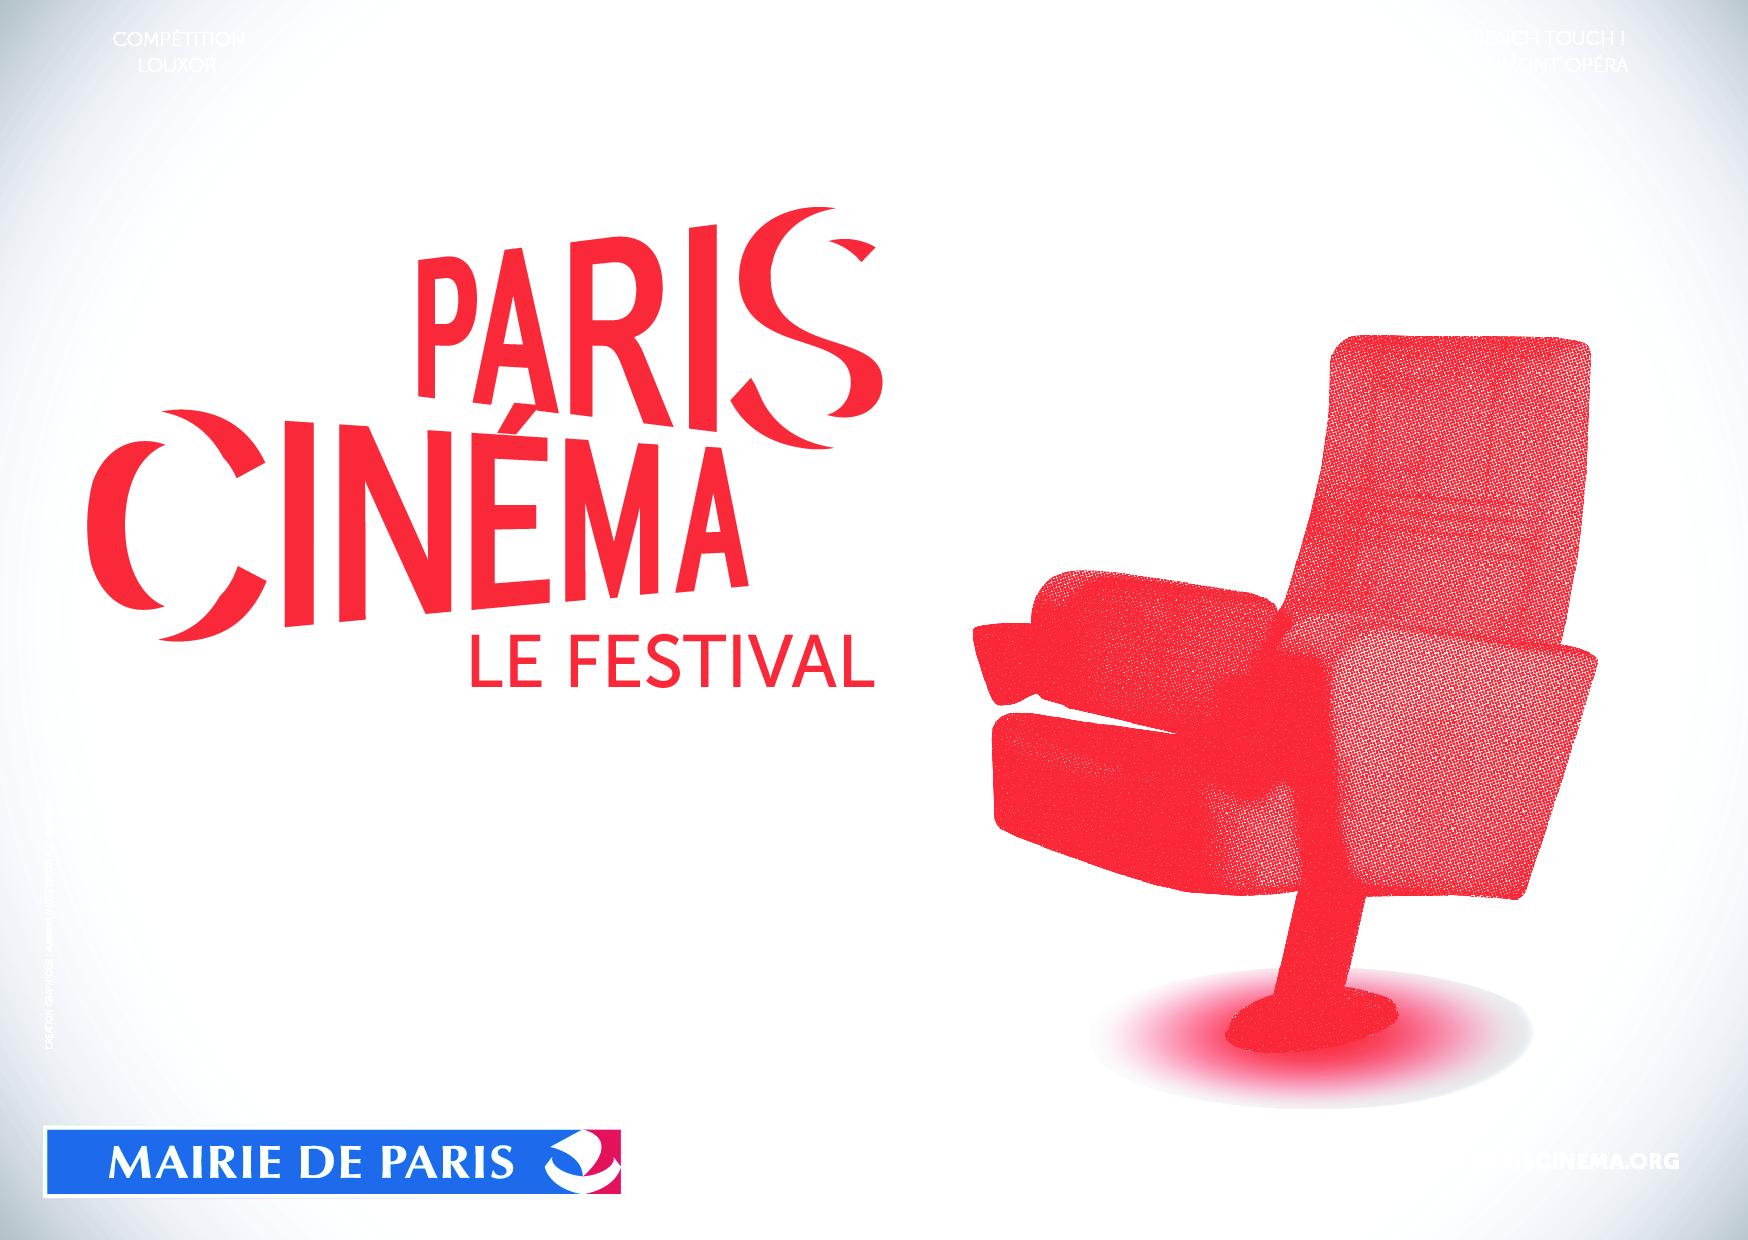 Paris Cinema Le Festival.jpg